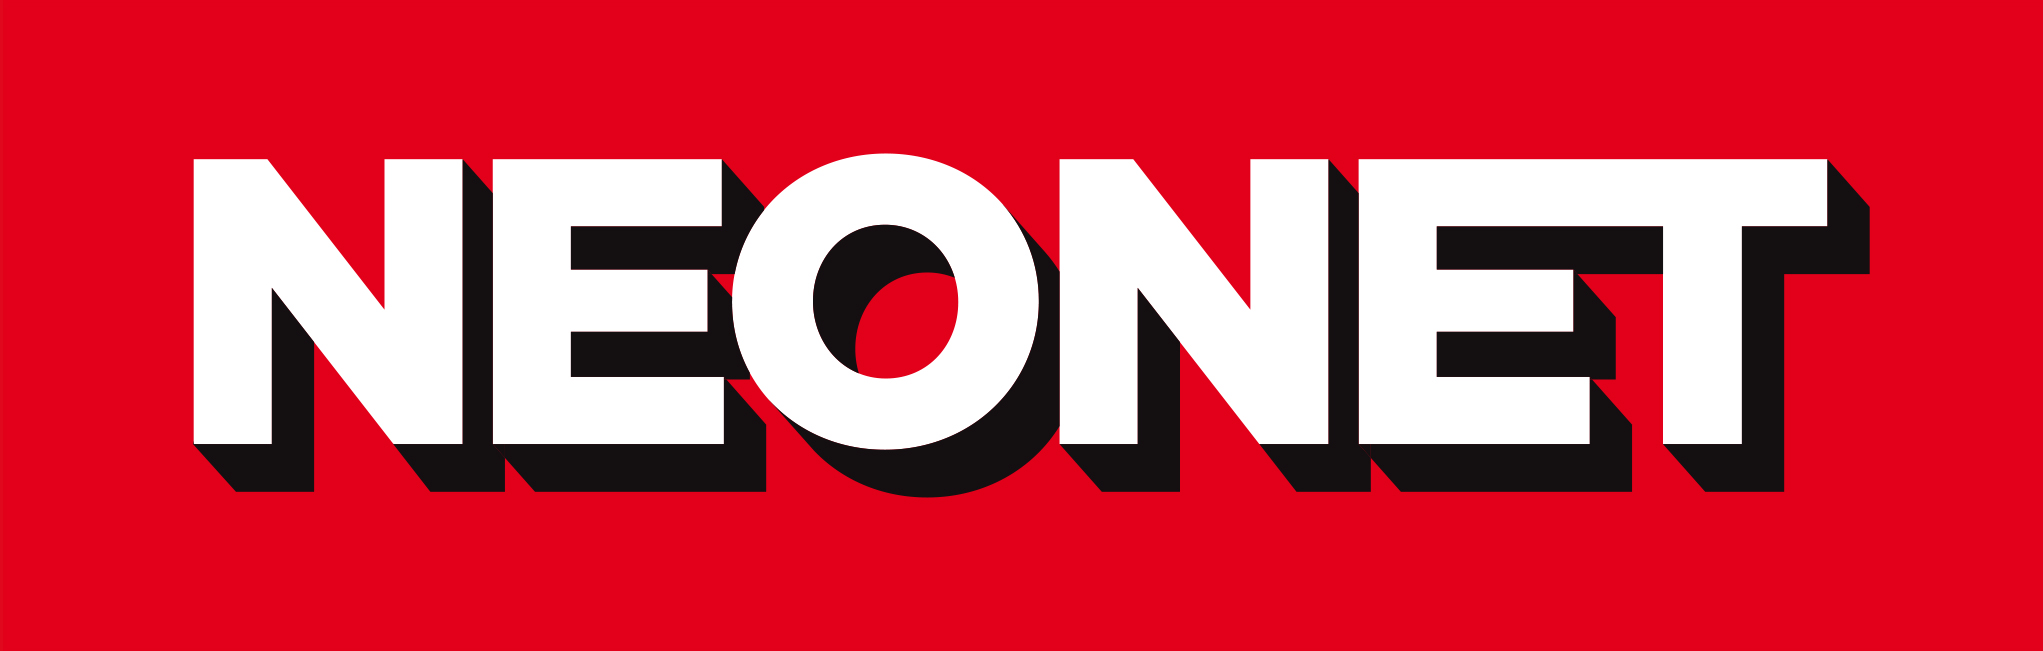 NeoNet logo